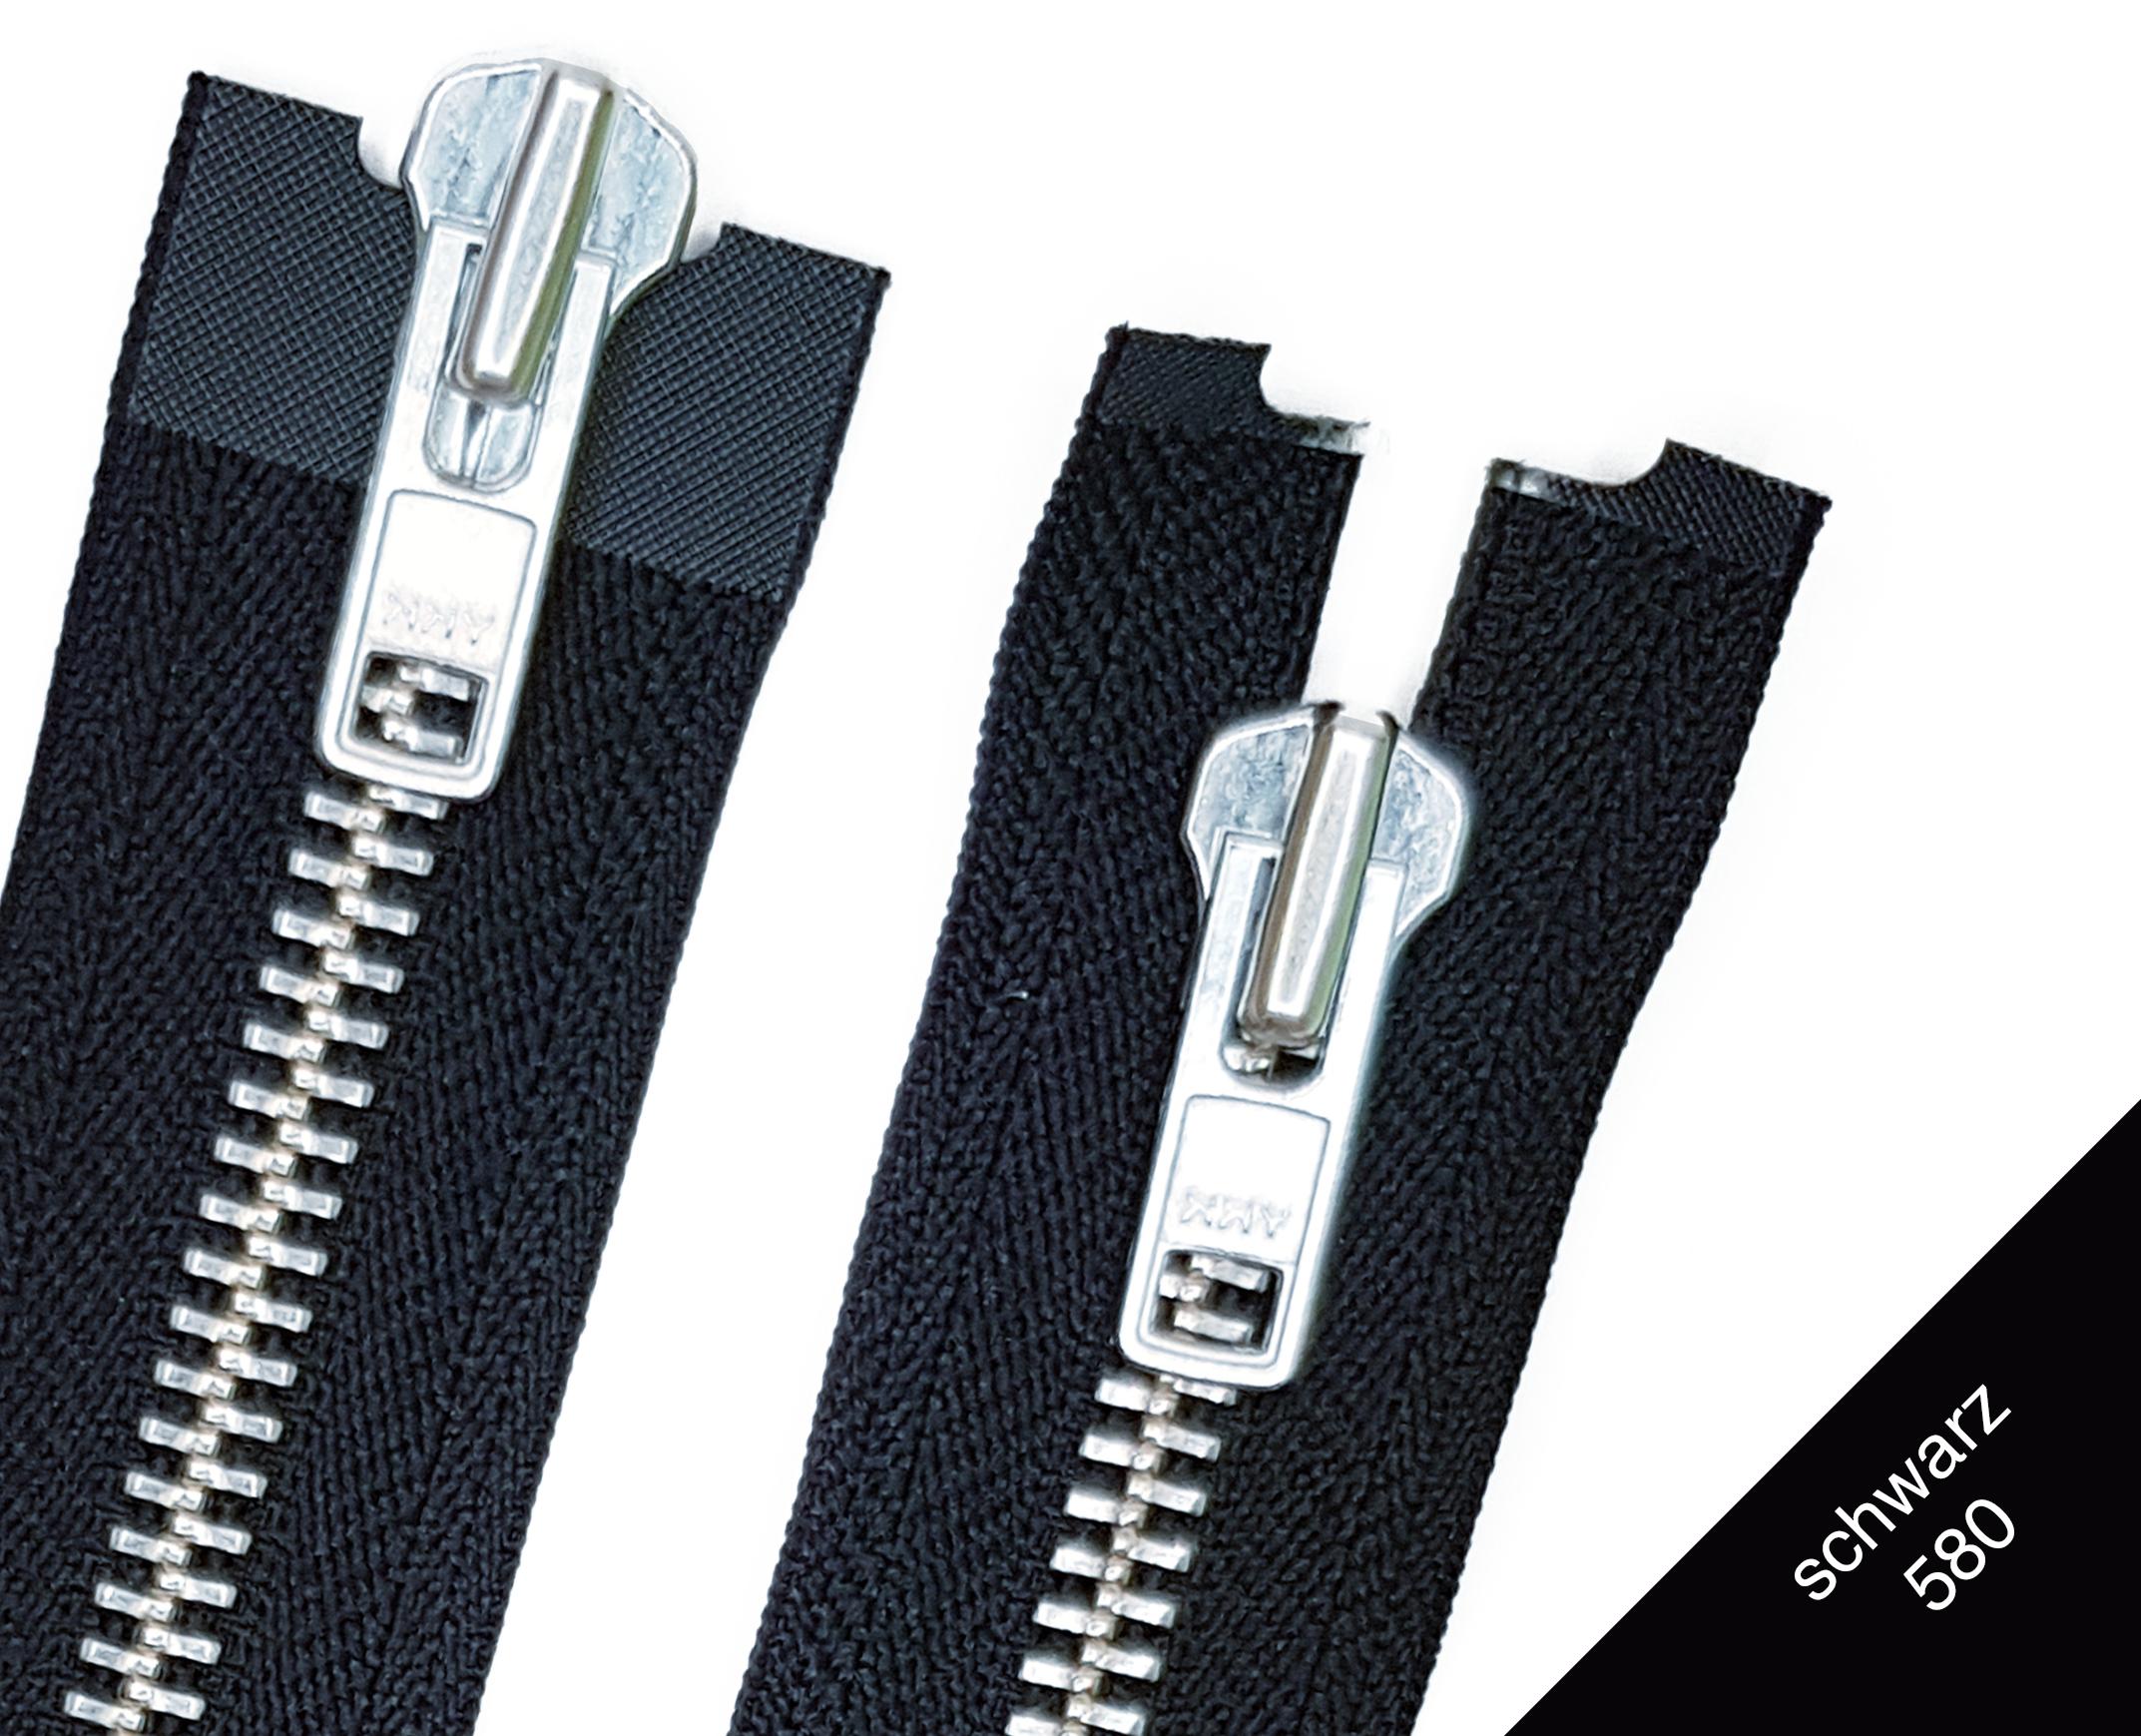 YKK Reißverschluss 2 Wege teilbar 5mm weiß 50 cm Metall silberne Zähne